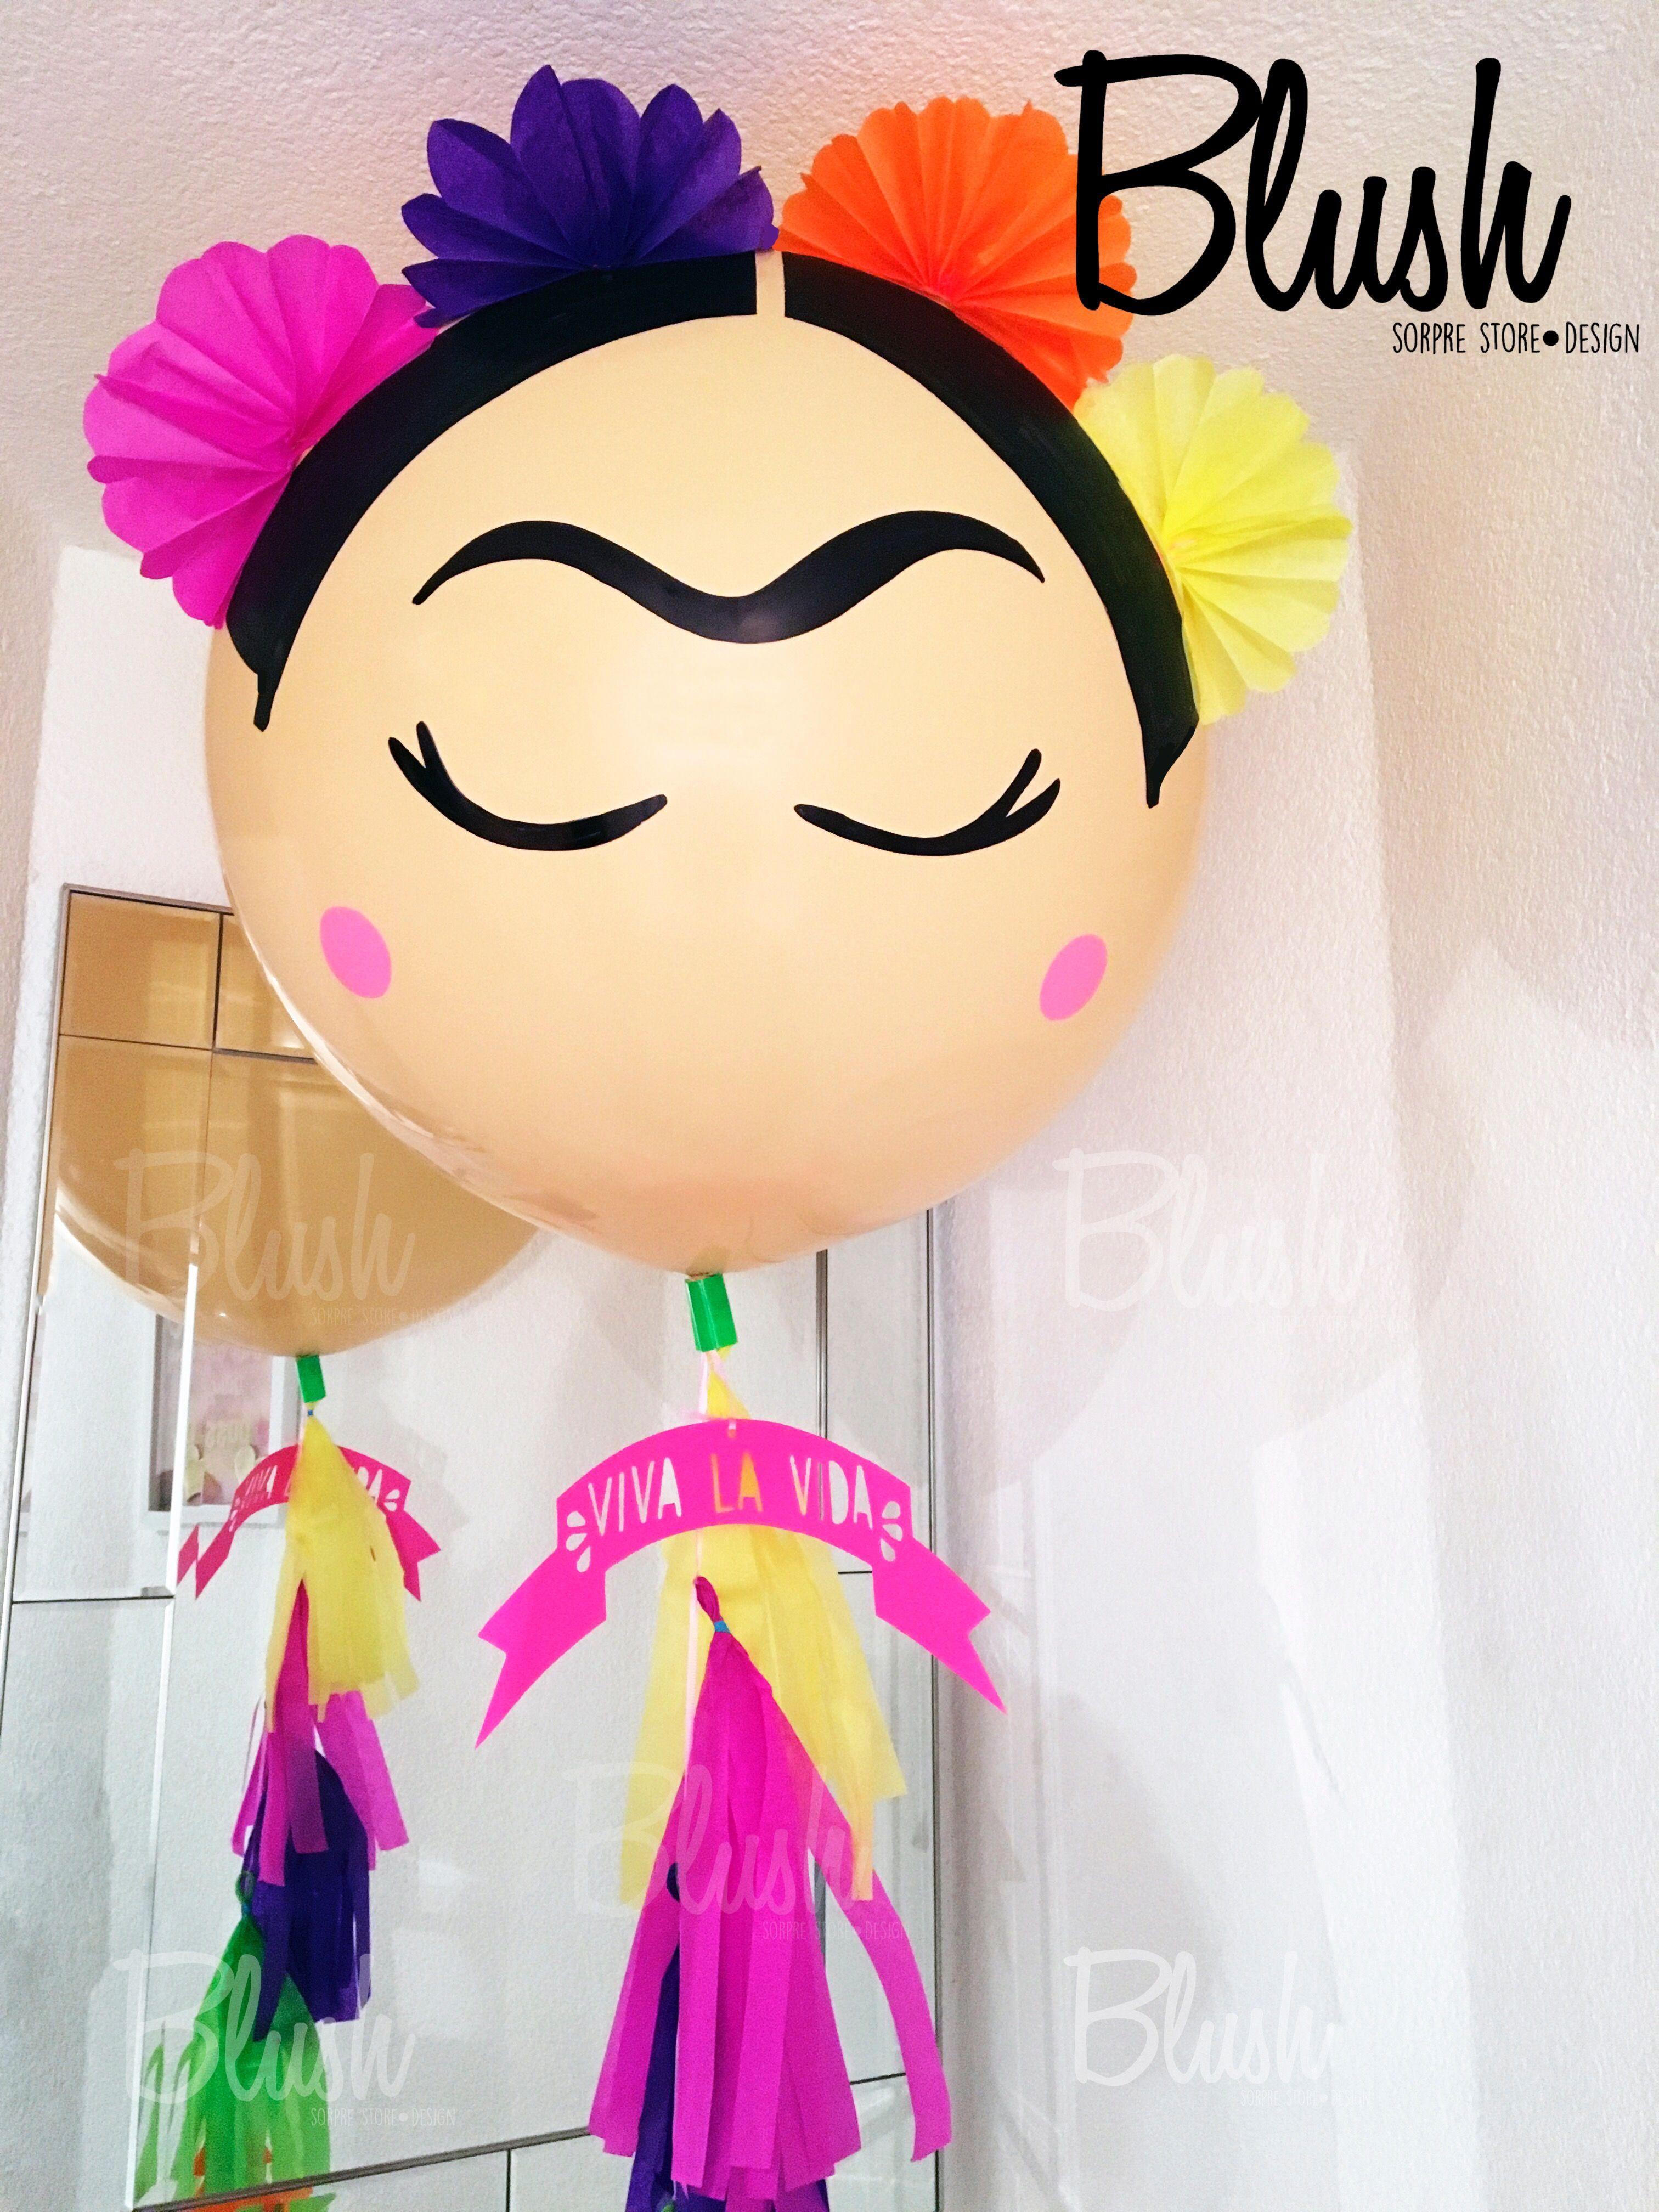 Frida kahlo party globo gigante giant balloon frida kahlo for Cuartos decorados de frida kahlo